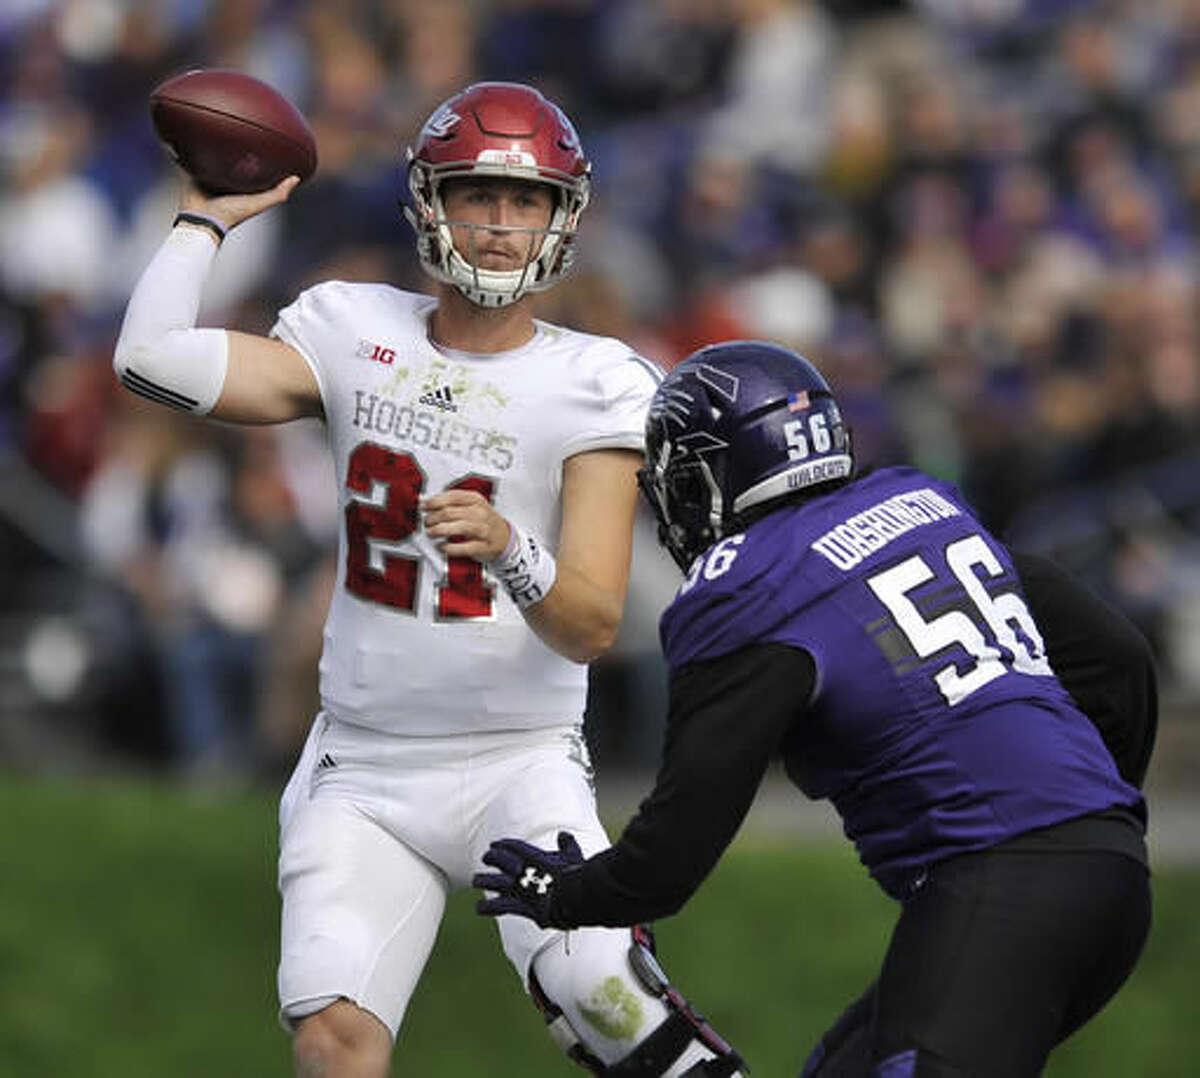 Indiana quarterback Richard Lagow (21) throws a pass against Northwestern's Xavier Washington (56) during the third quarter of an NCAA college football game Saturday, Oct. 22, 2016, in Evanston, Ill. (AP Photo/Paul Beaty)